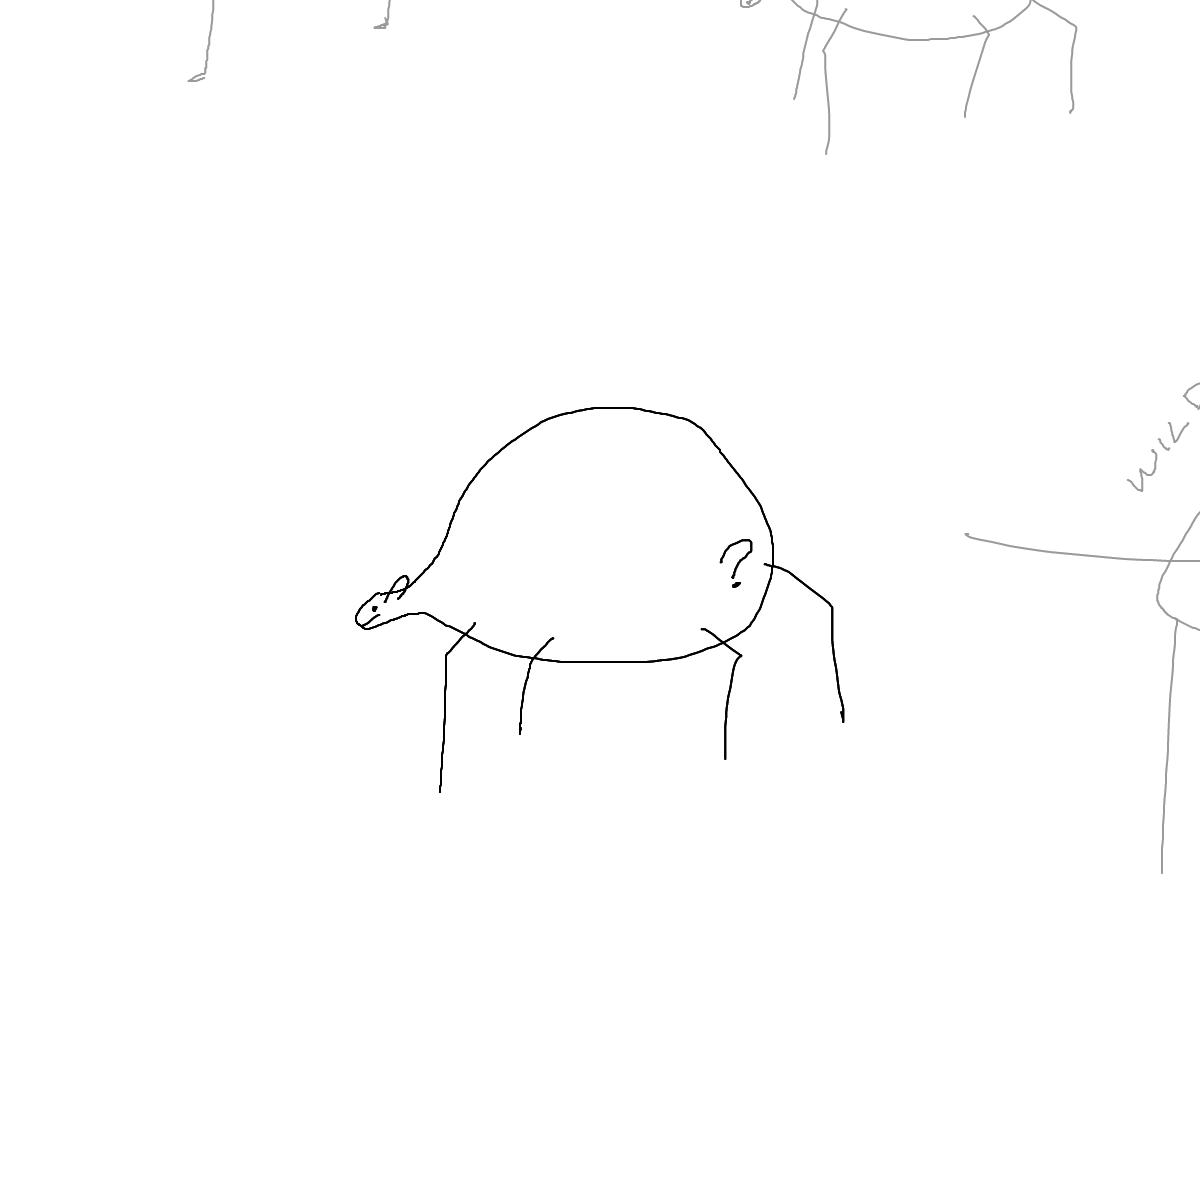 BAAAM drawing#2135 lat:52.4750328063964840lng: 13.4067850112915040